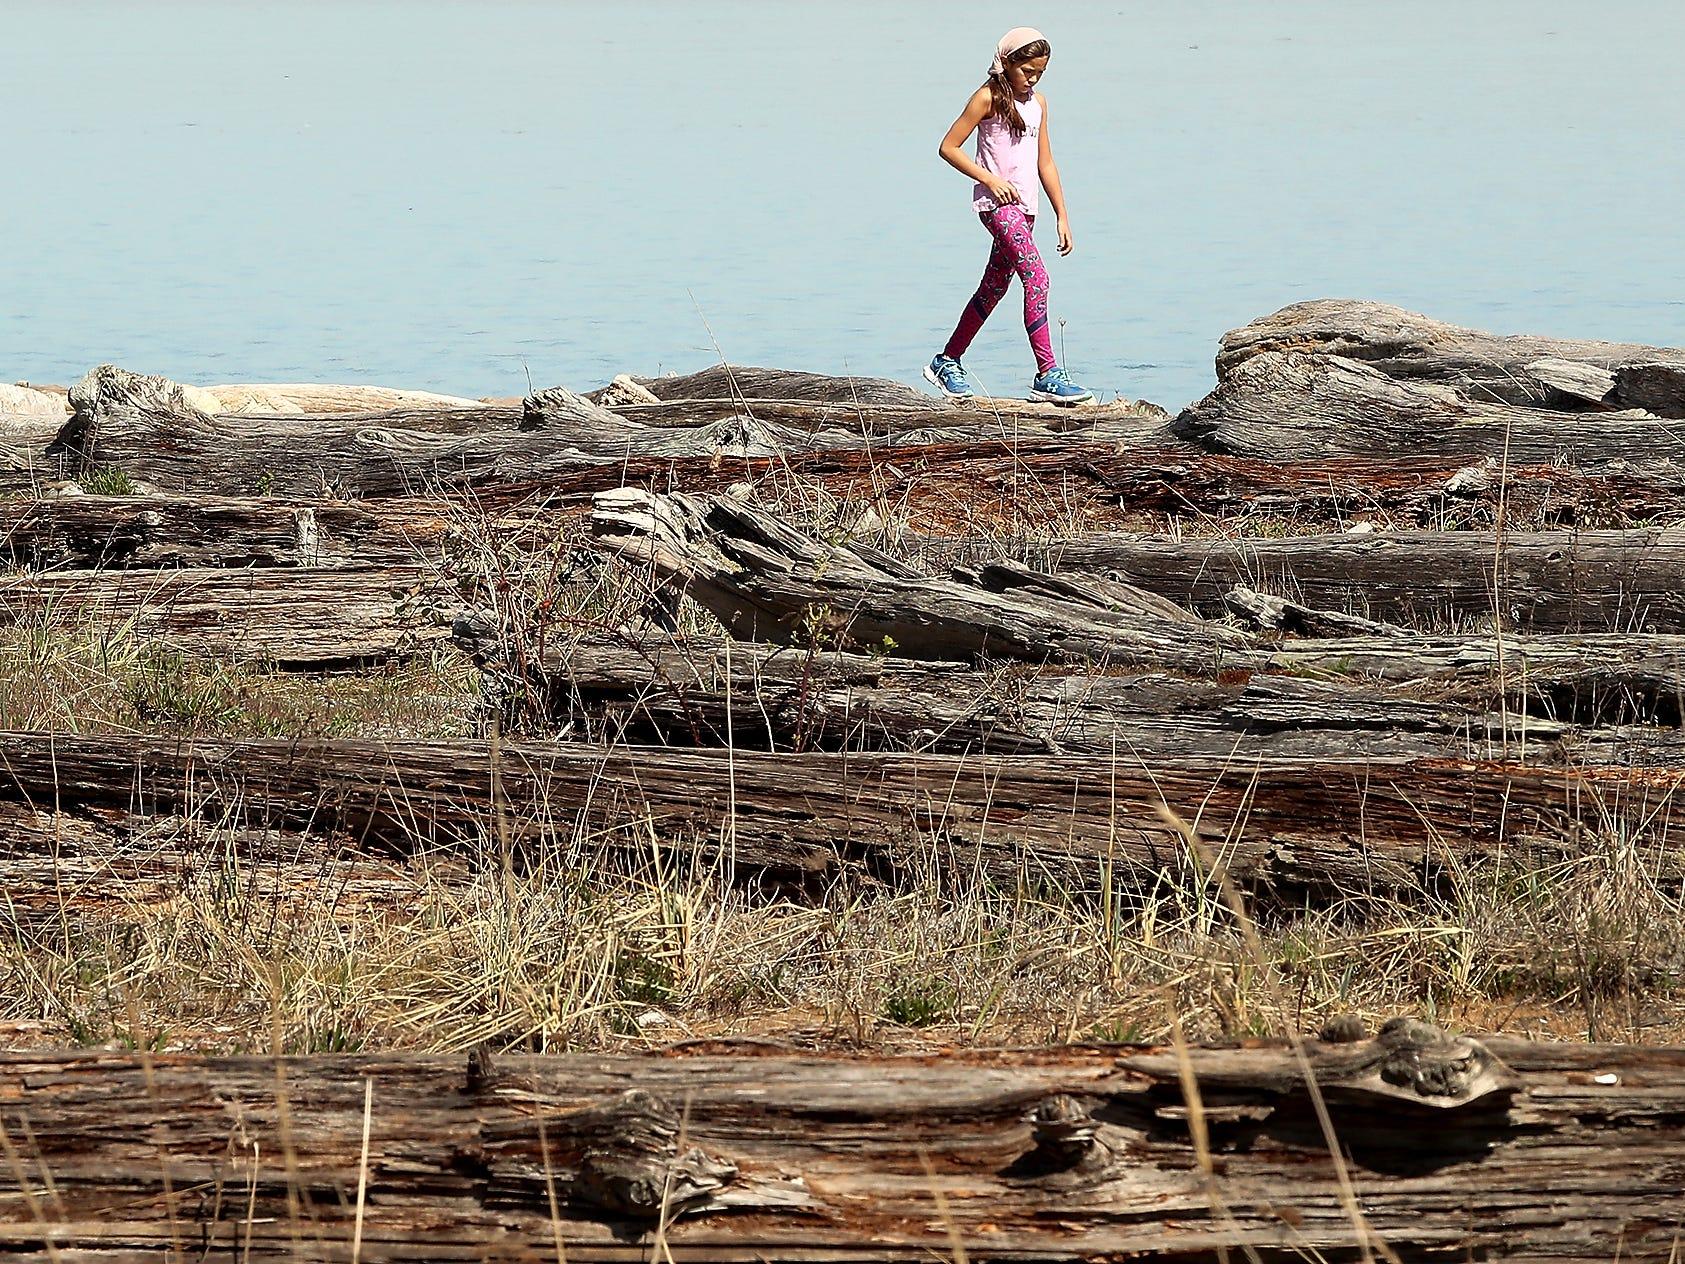 Kekeya Maher-Sherman, 9, walks atop the driftwood logs strewn along the shore of Bainbridge Island's Fay Bainbridge Park on Thursday, April 4, 2019.